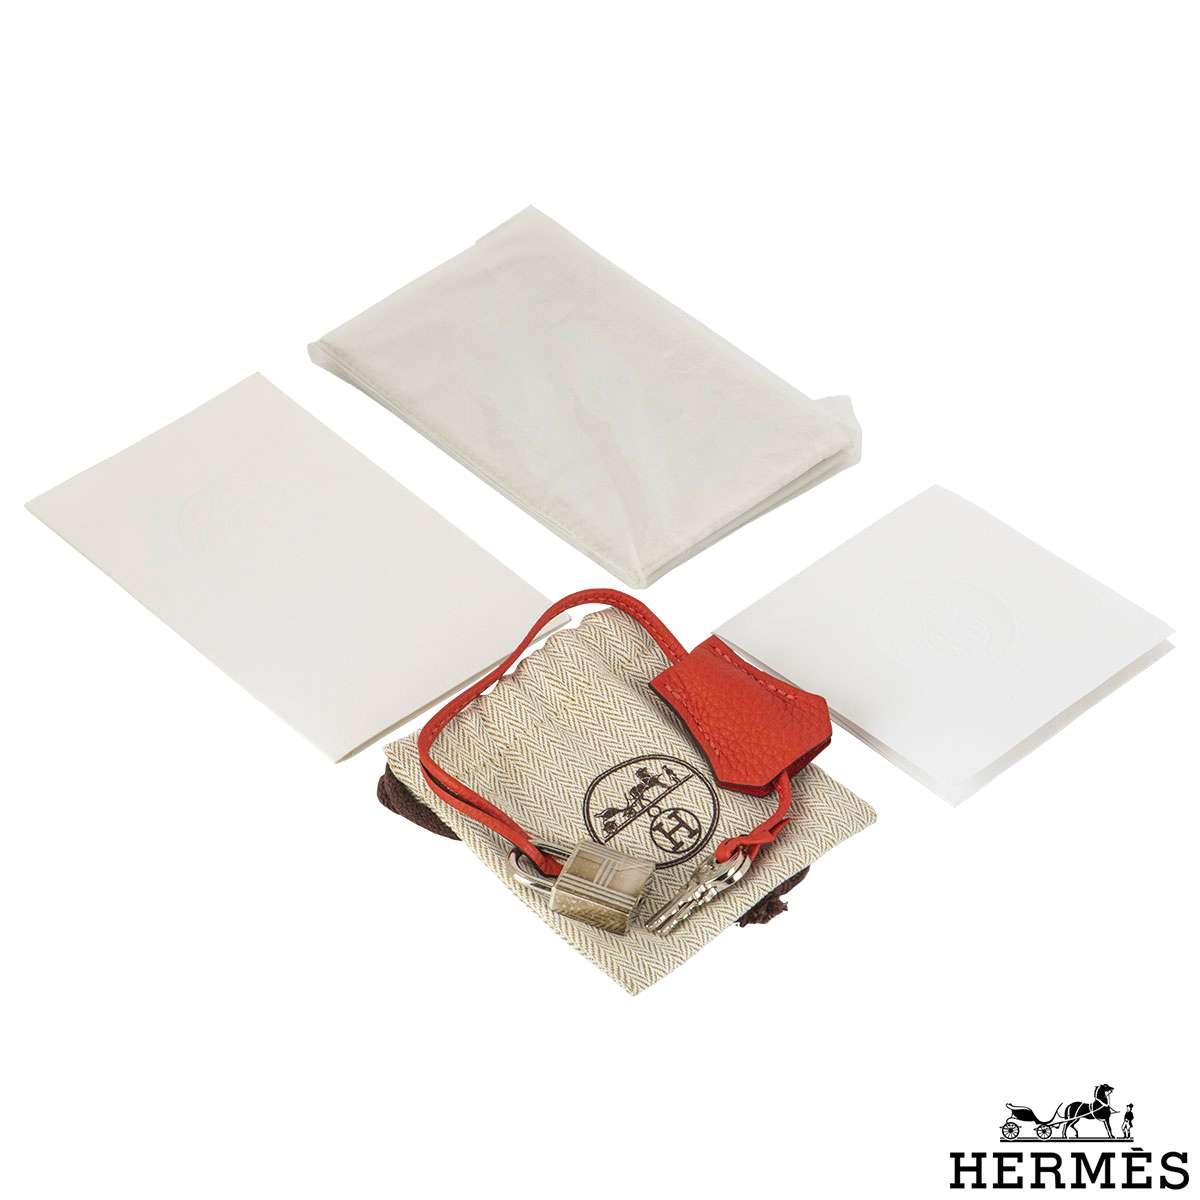 Hermès Rouge Pivoine 30cm Birkin Bag